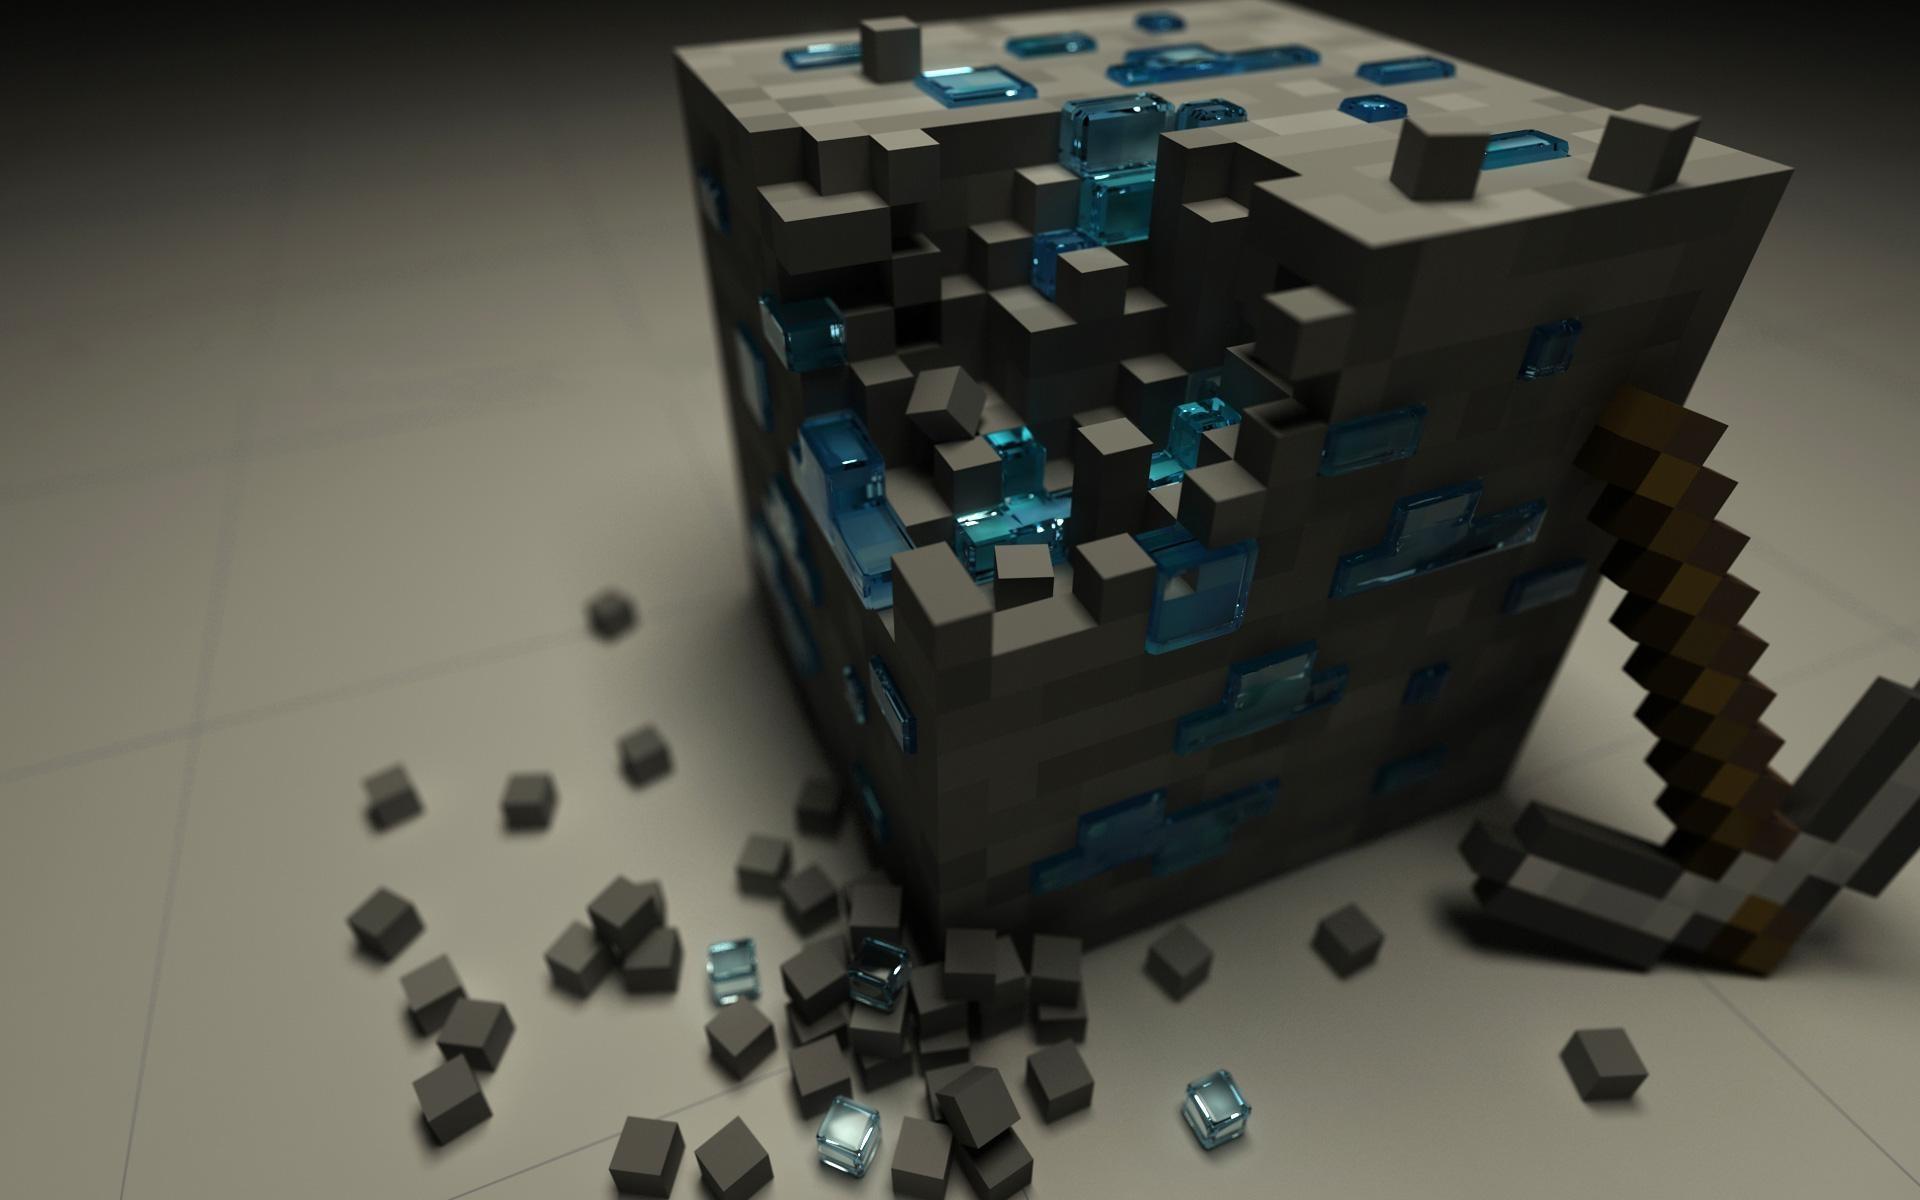 Minecraft Diamond Wallpapers Phone On Wallpaper Hd 1920 x 1200 px 692.31 KB  herobrine enderdragon creeper